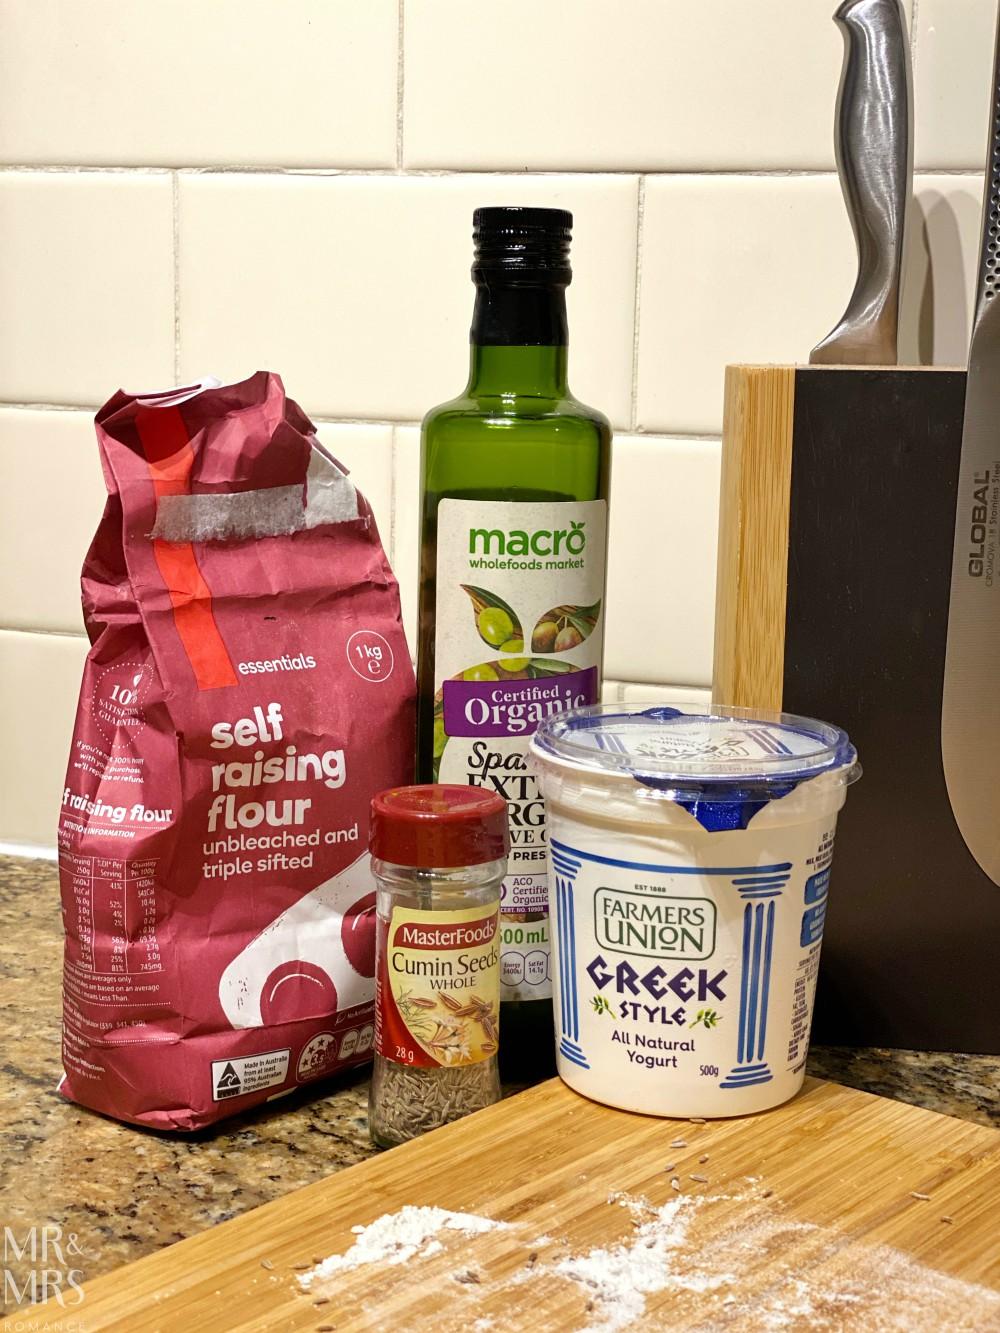 Easy no-yeast naan bread recipe ingredients